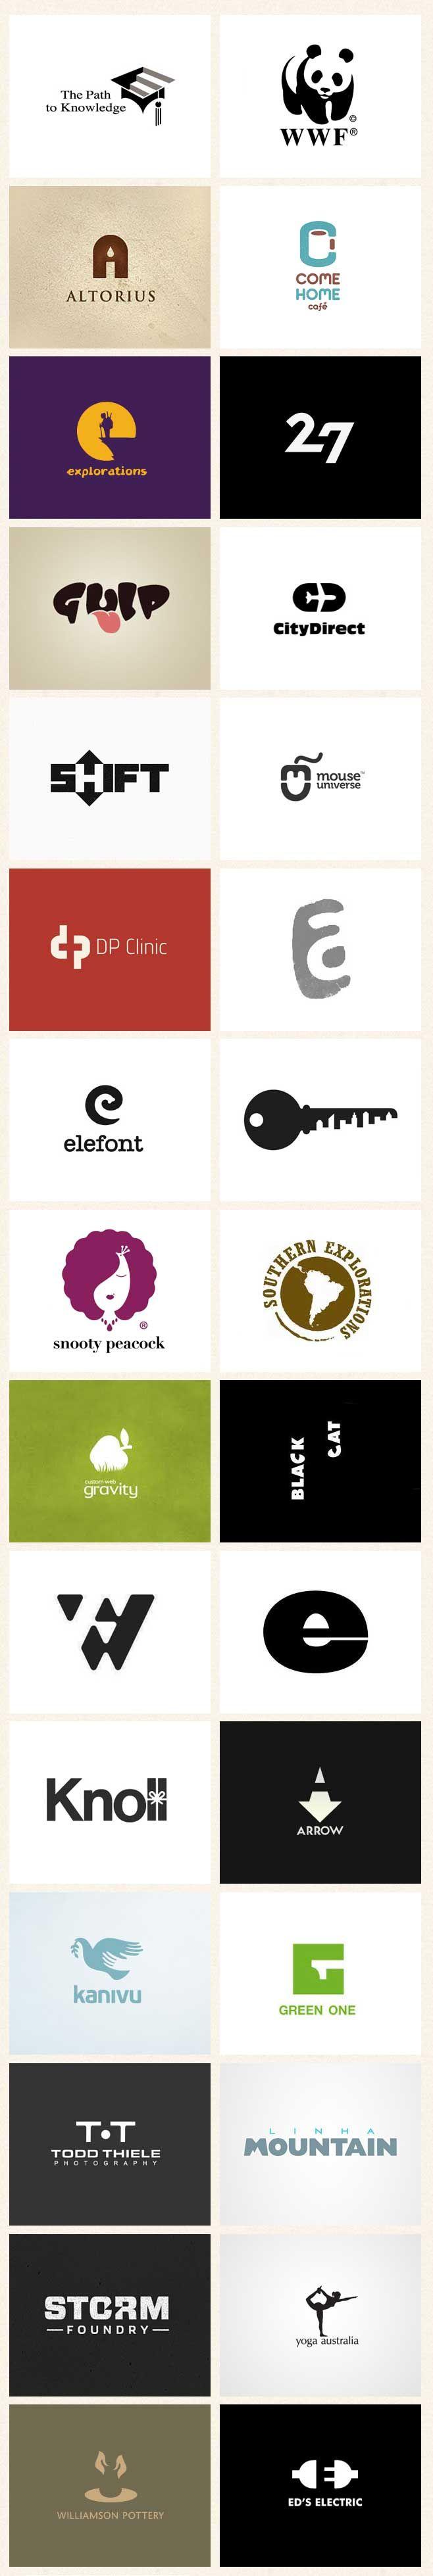 Best 25 negative space ideas on pinterest for Negative space design